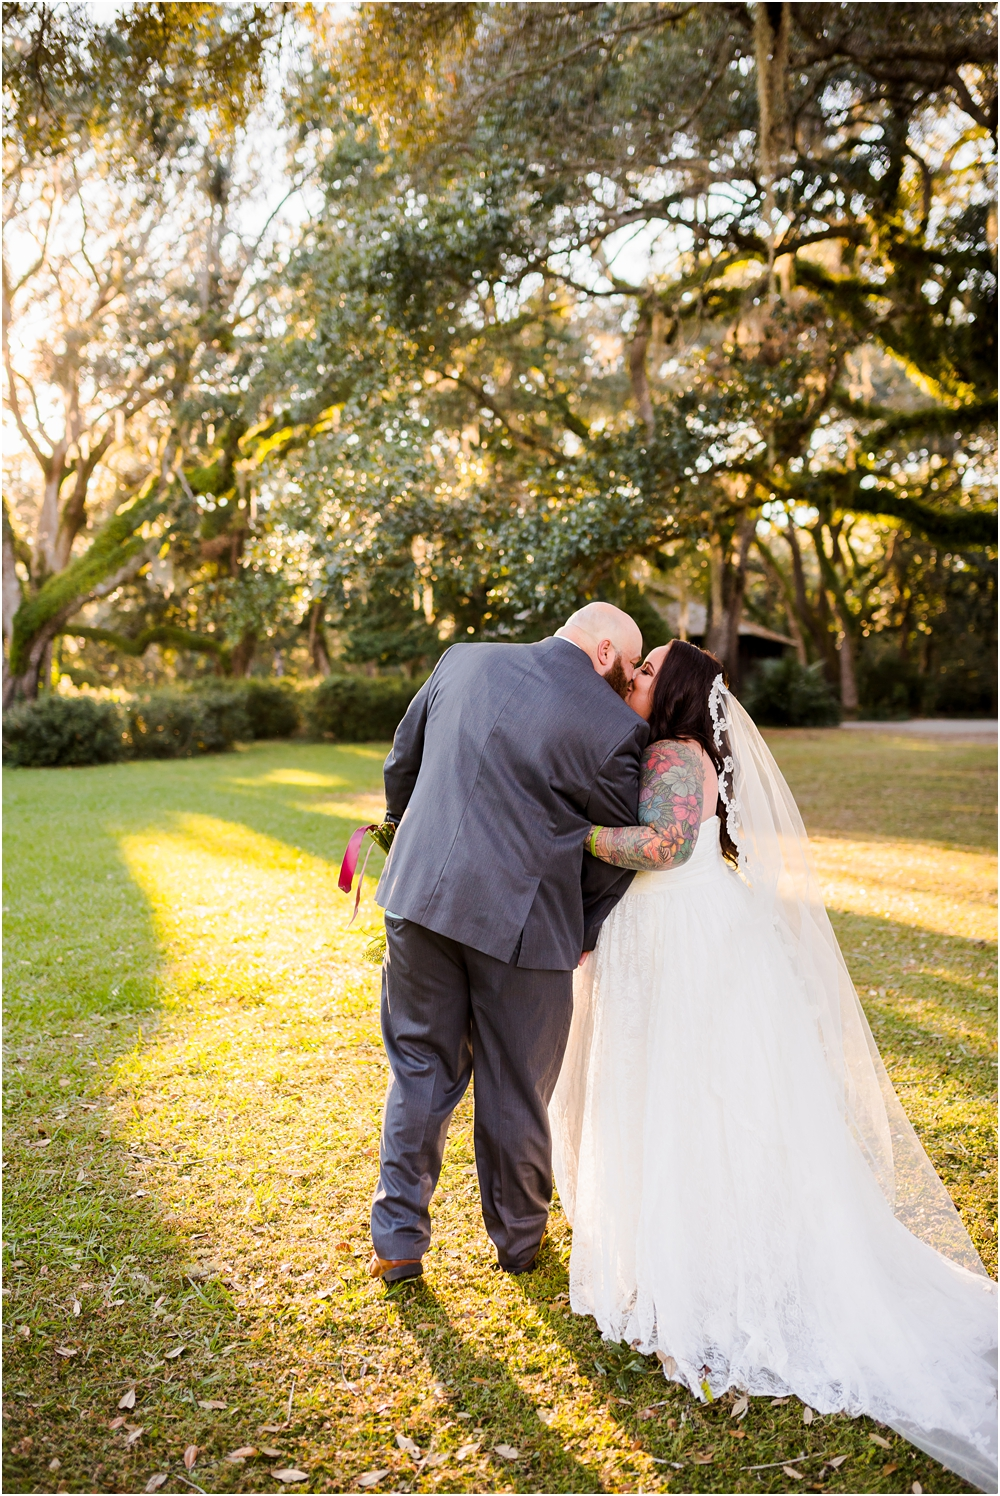 Eden-Gardens-florida-wedding-photographer-kiersten-stevenson-photography-79.jpg